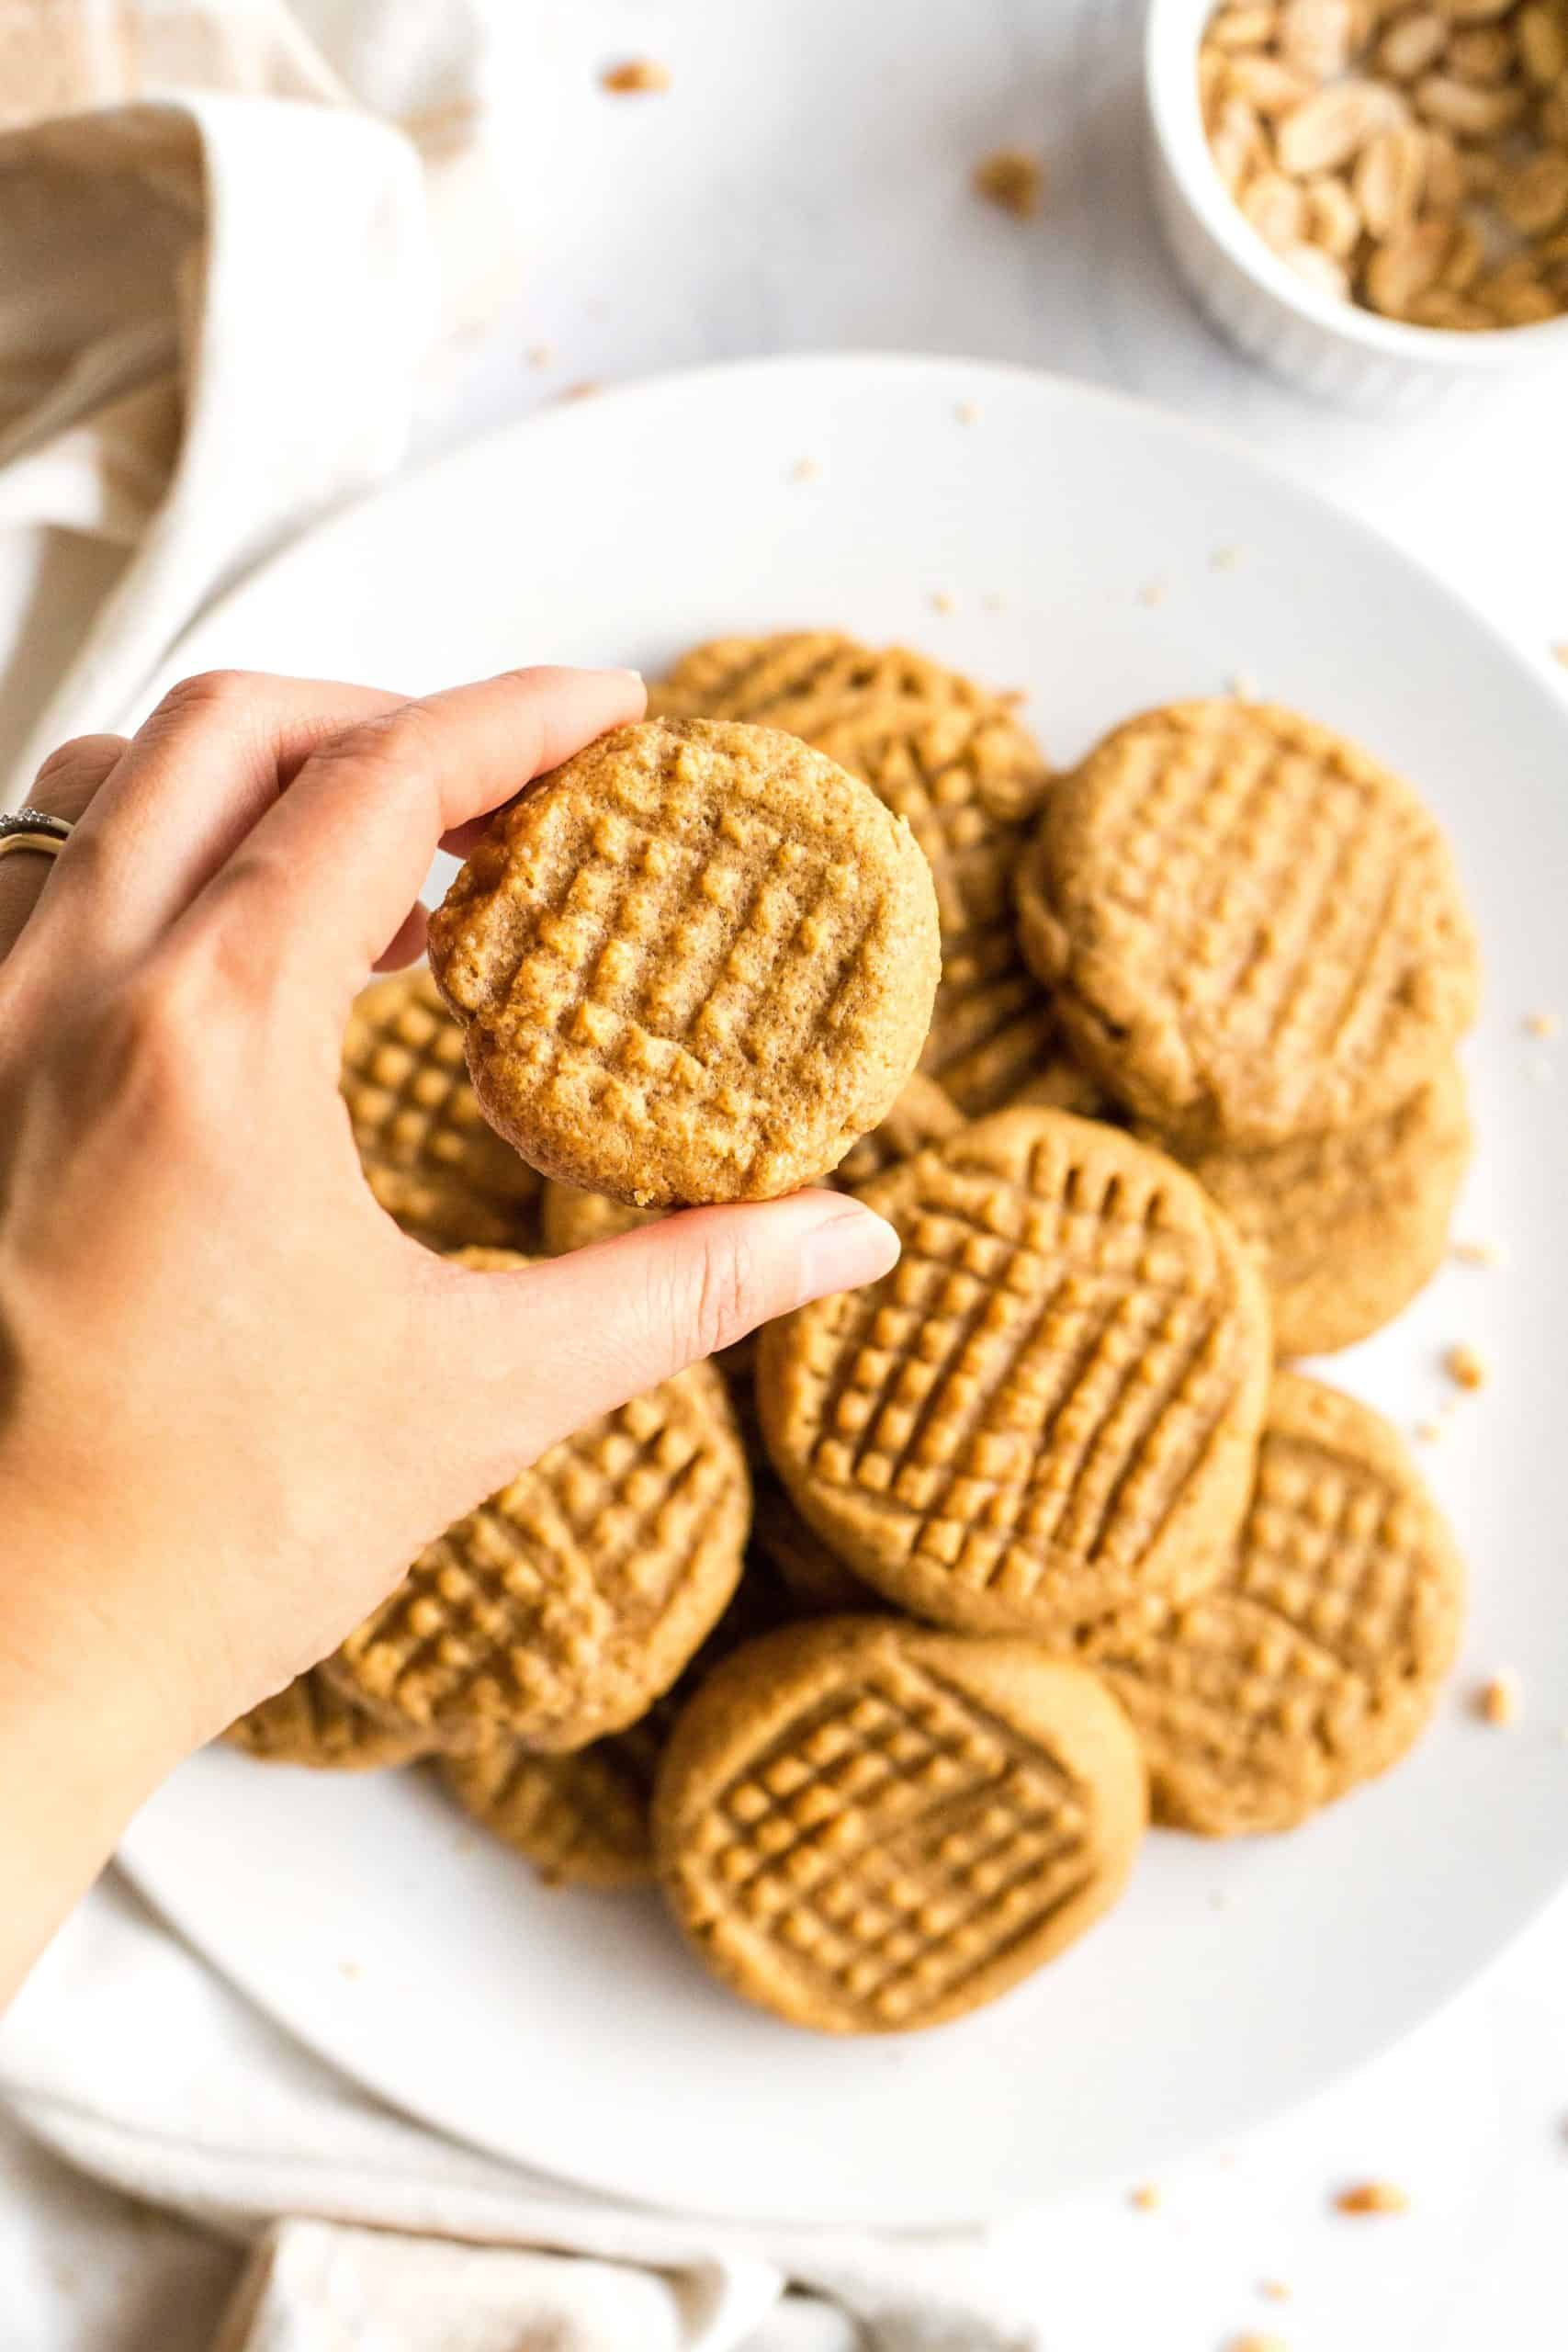 Hand holding up a flourless peanut butter cookie.